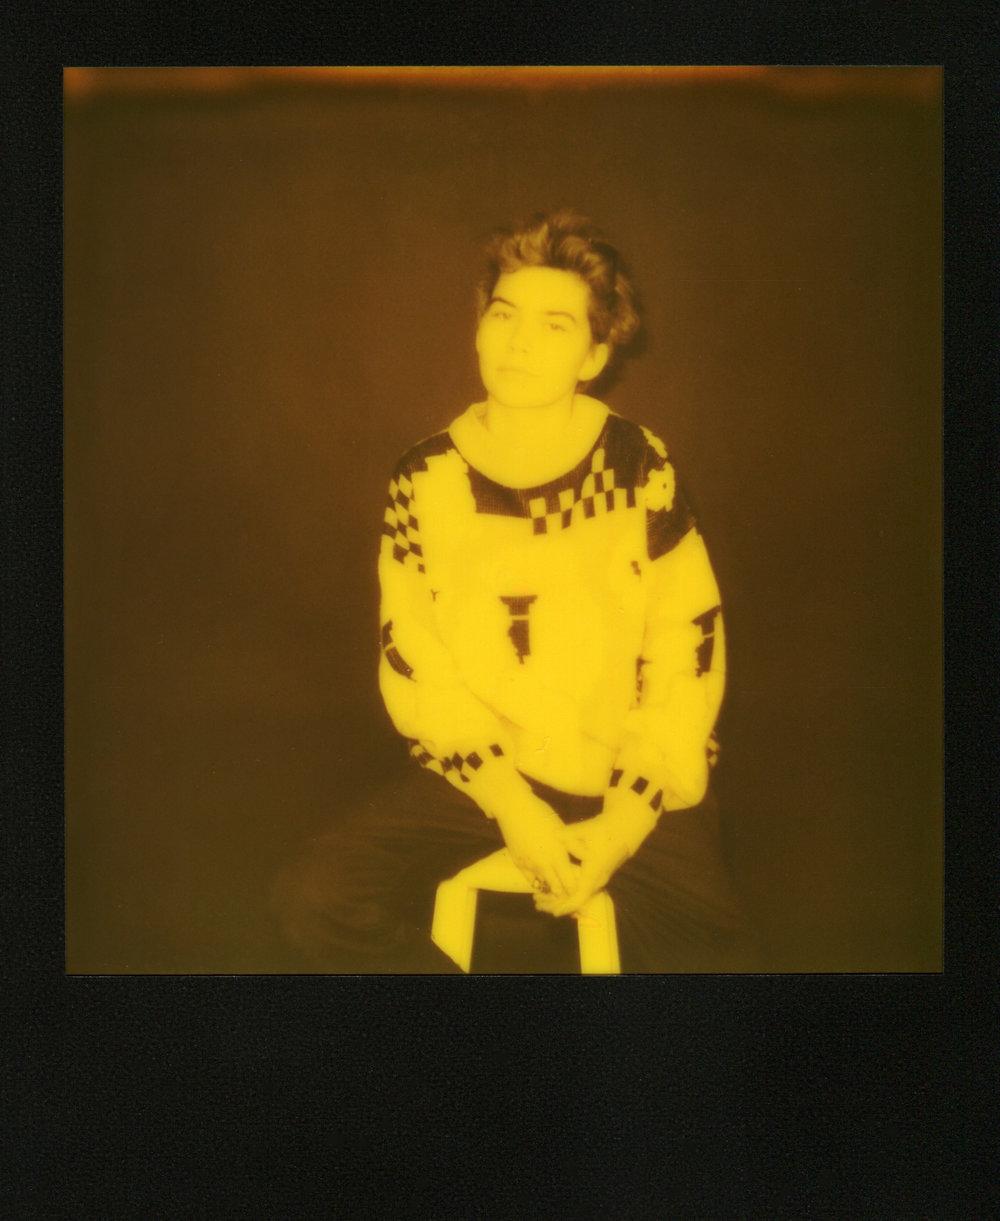 Finn-Yellow-Polaroid-casenruiz.jpg